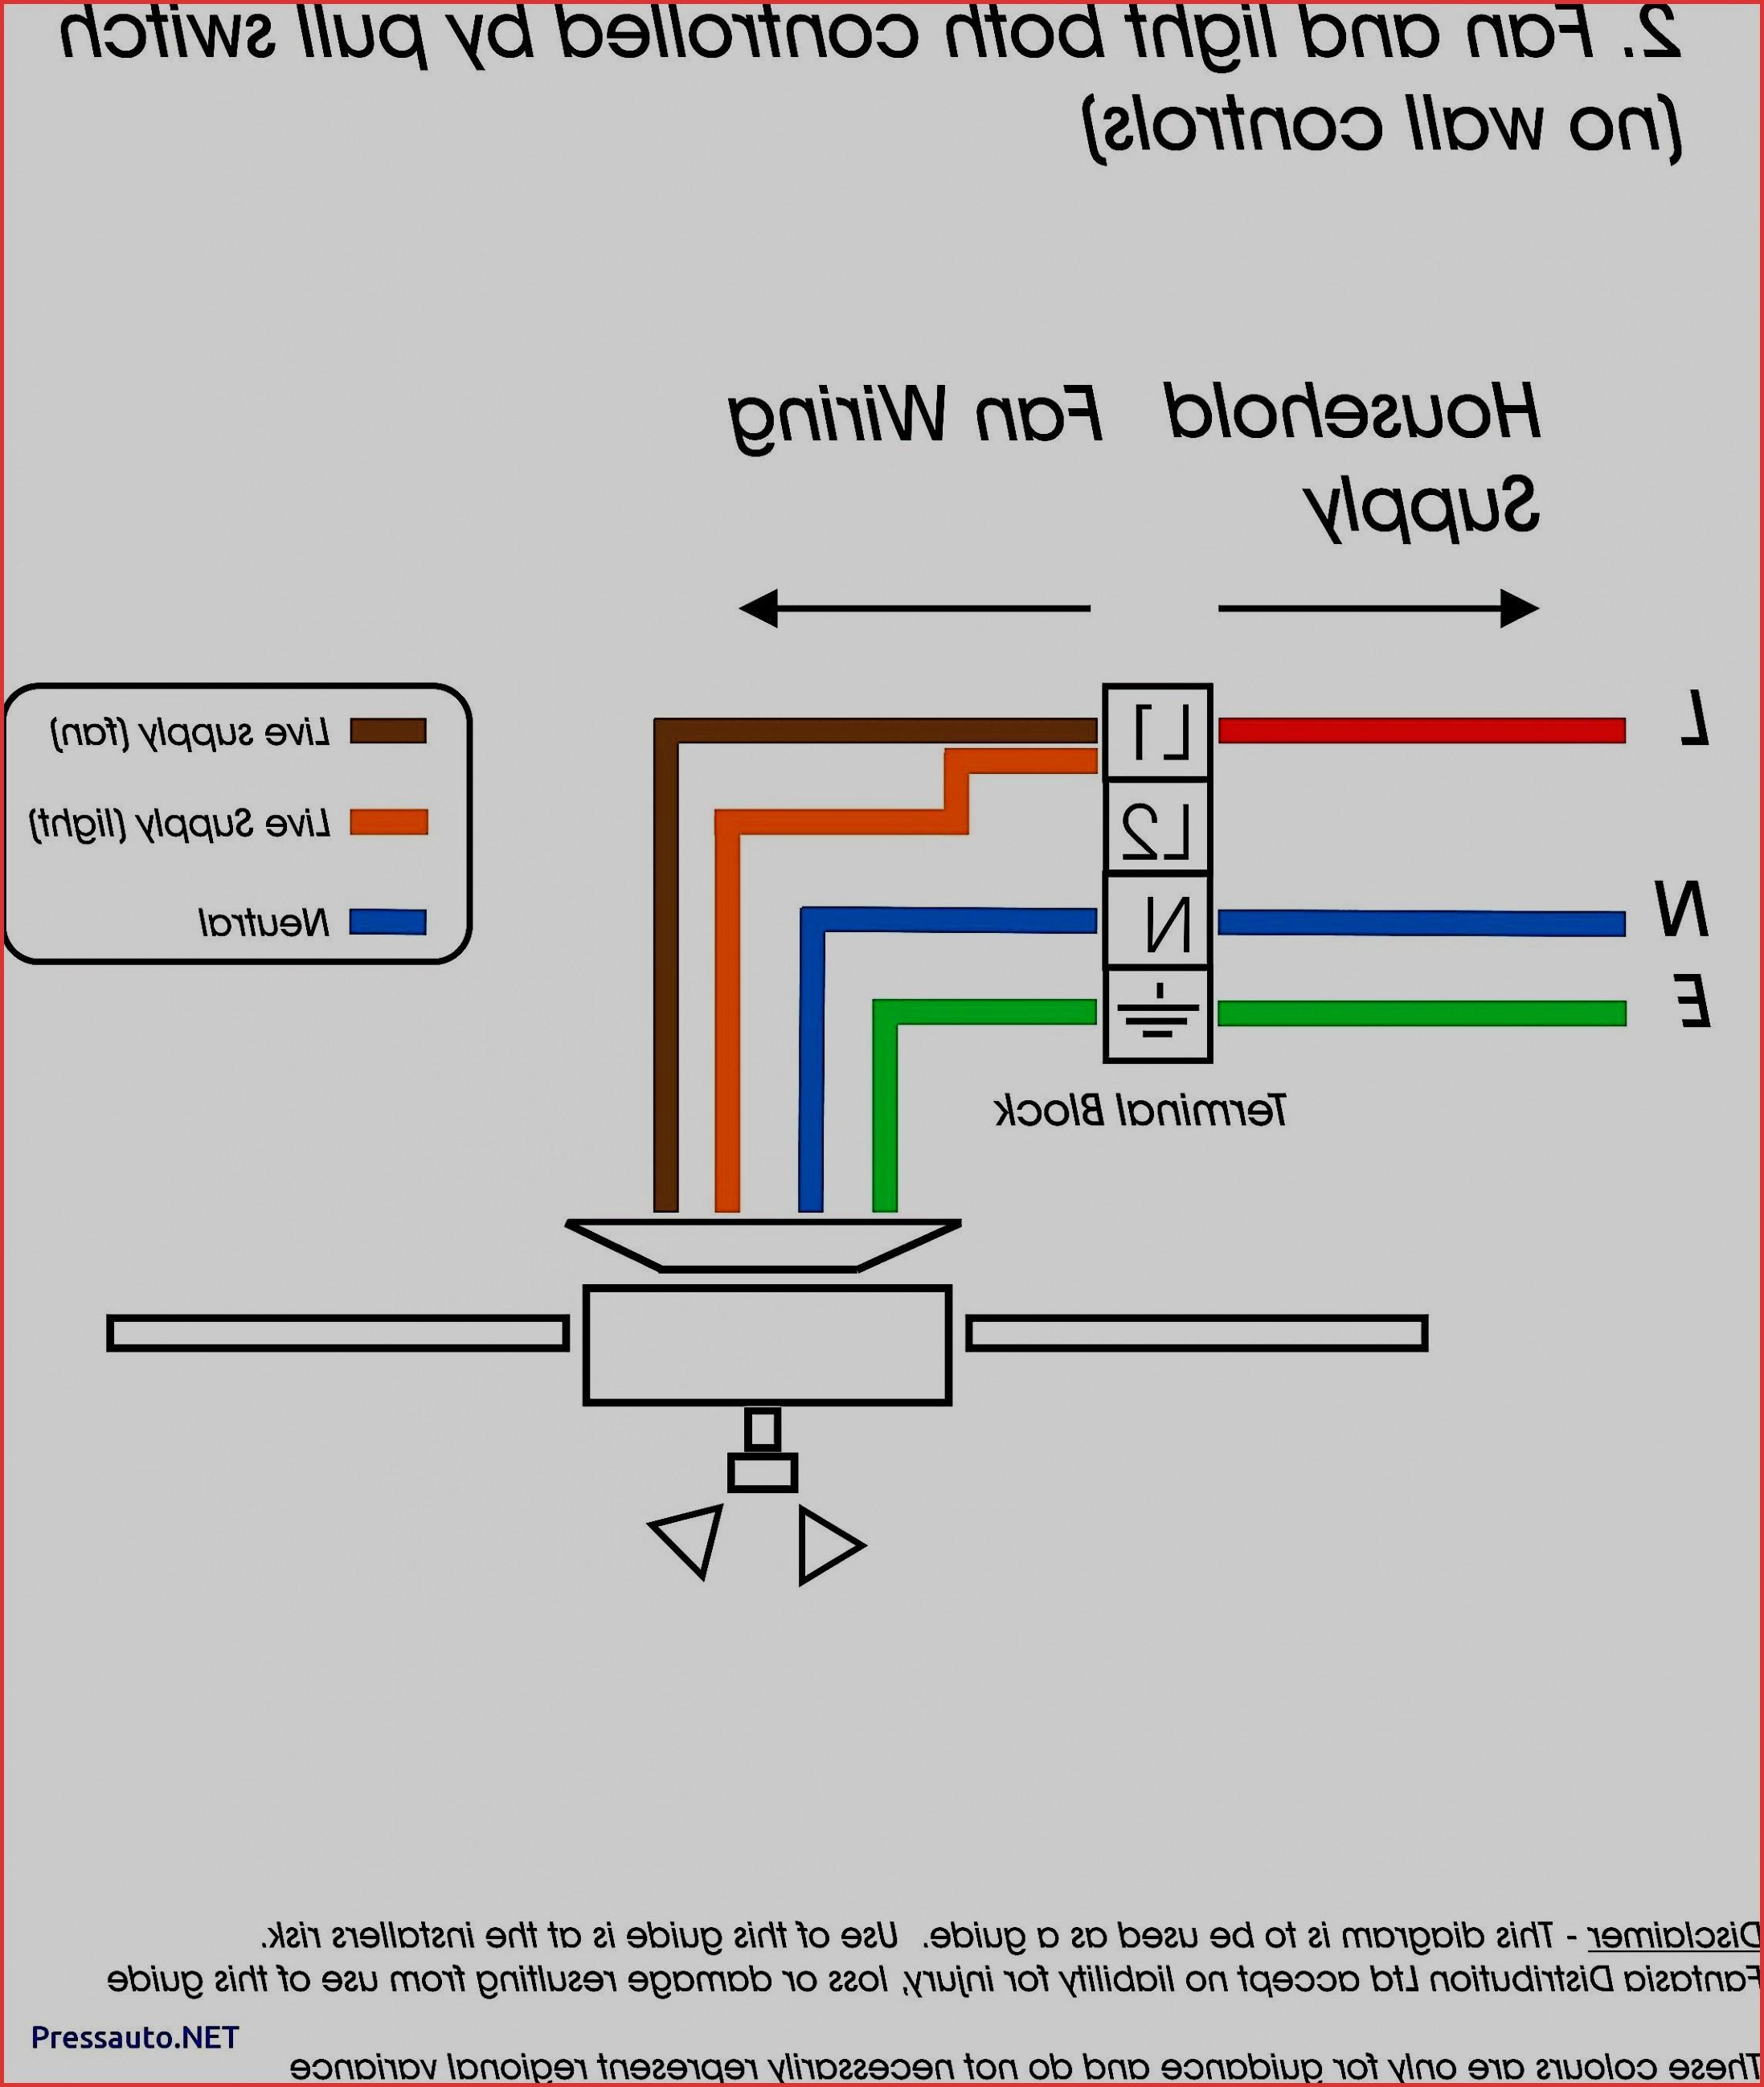 2002 Dodge Ram Radio Wiring Diagram 1998 nissan maxima radio wiring diagram book of power seat